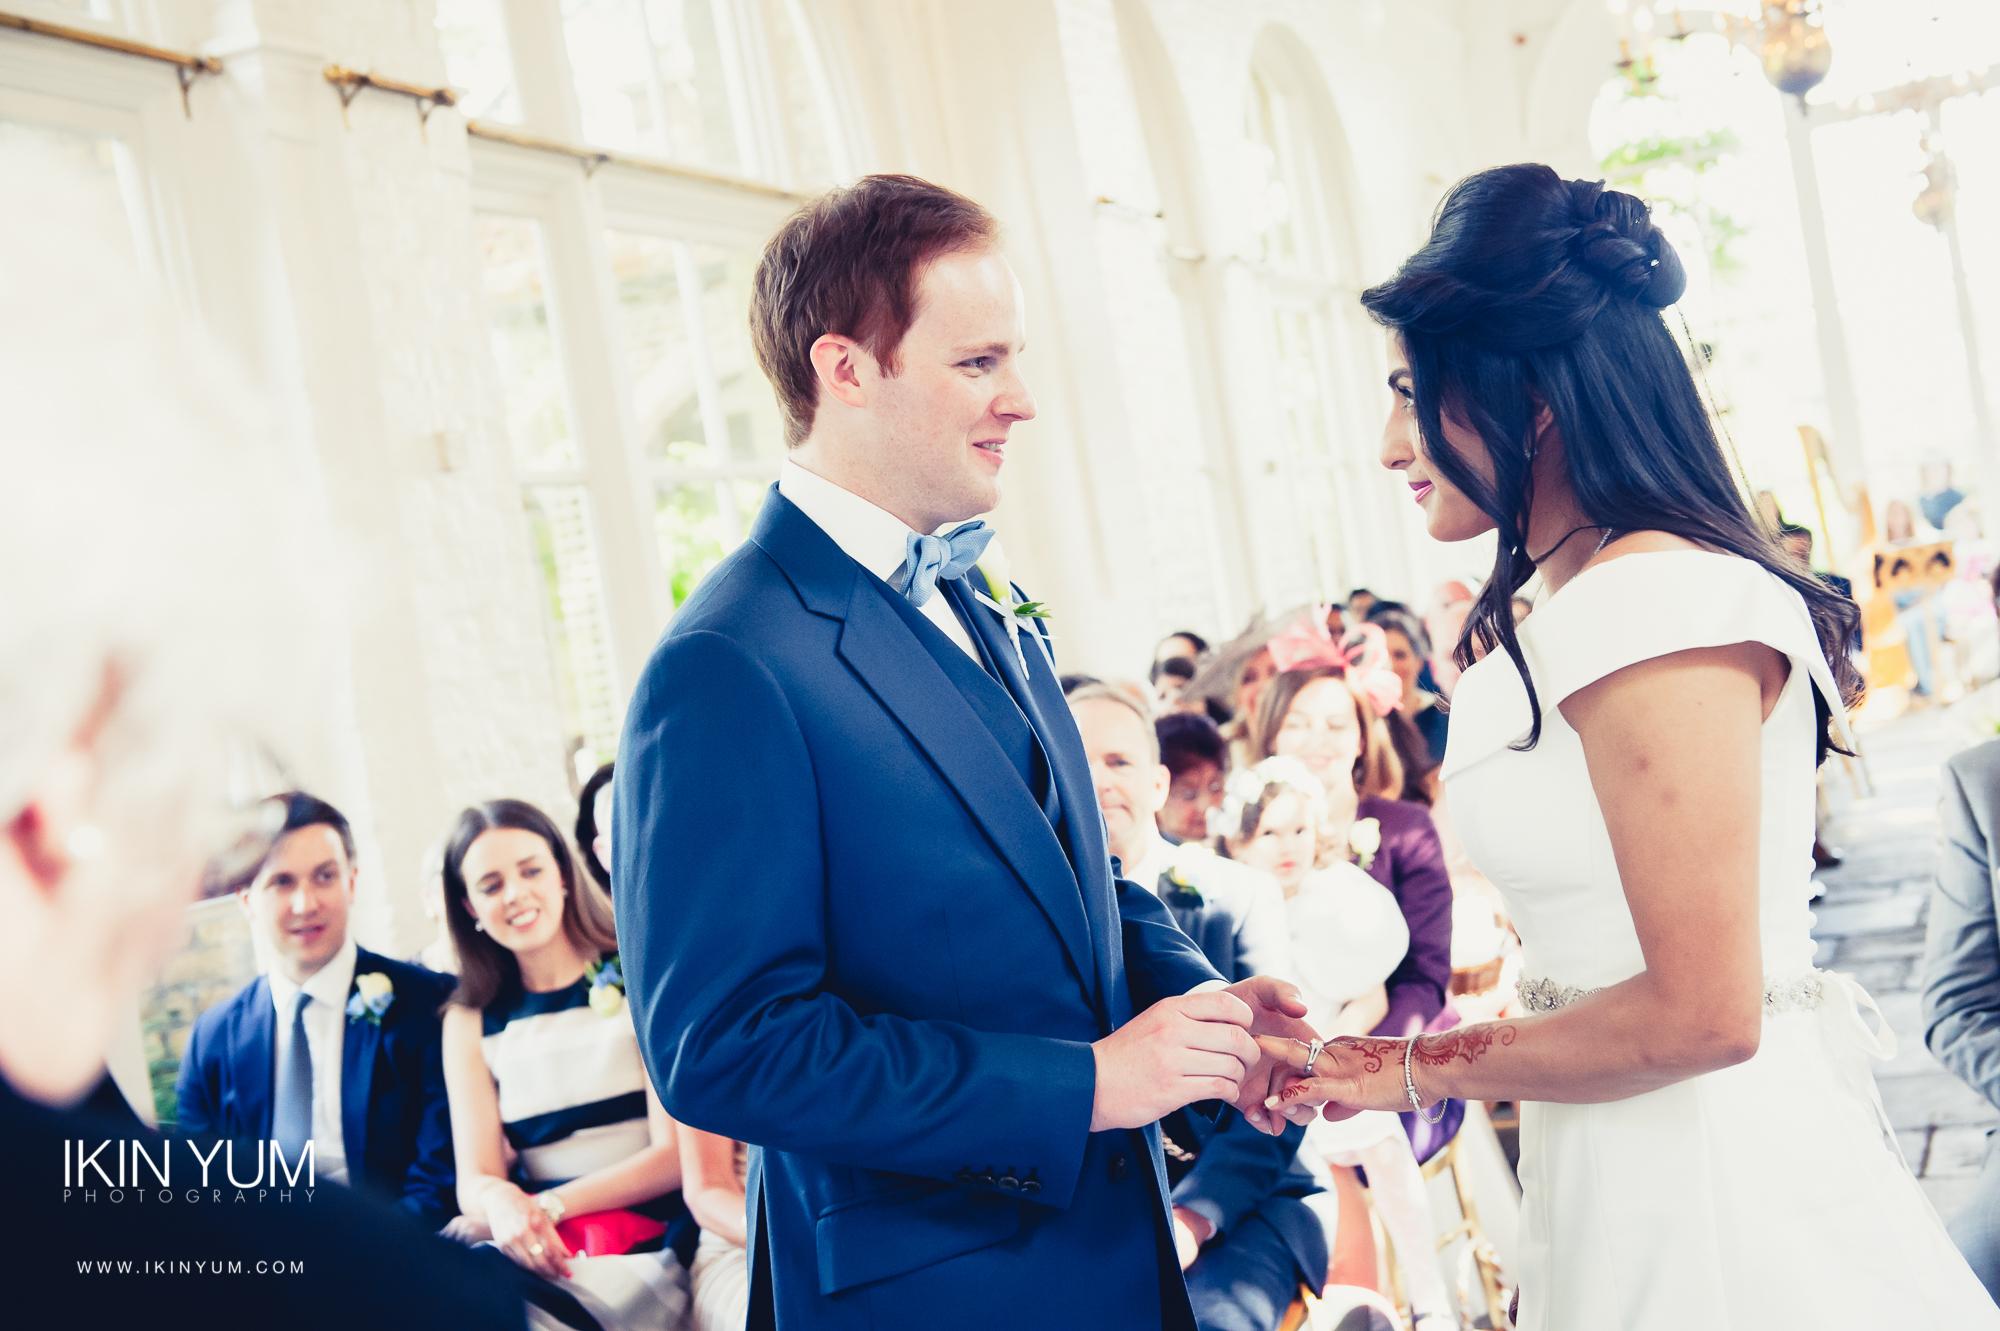 Holland Park Wedding - Ikin Yum Photography-0034.jpg